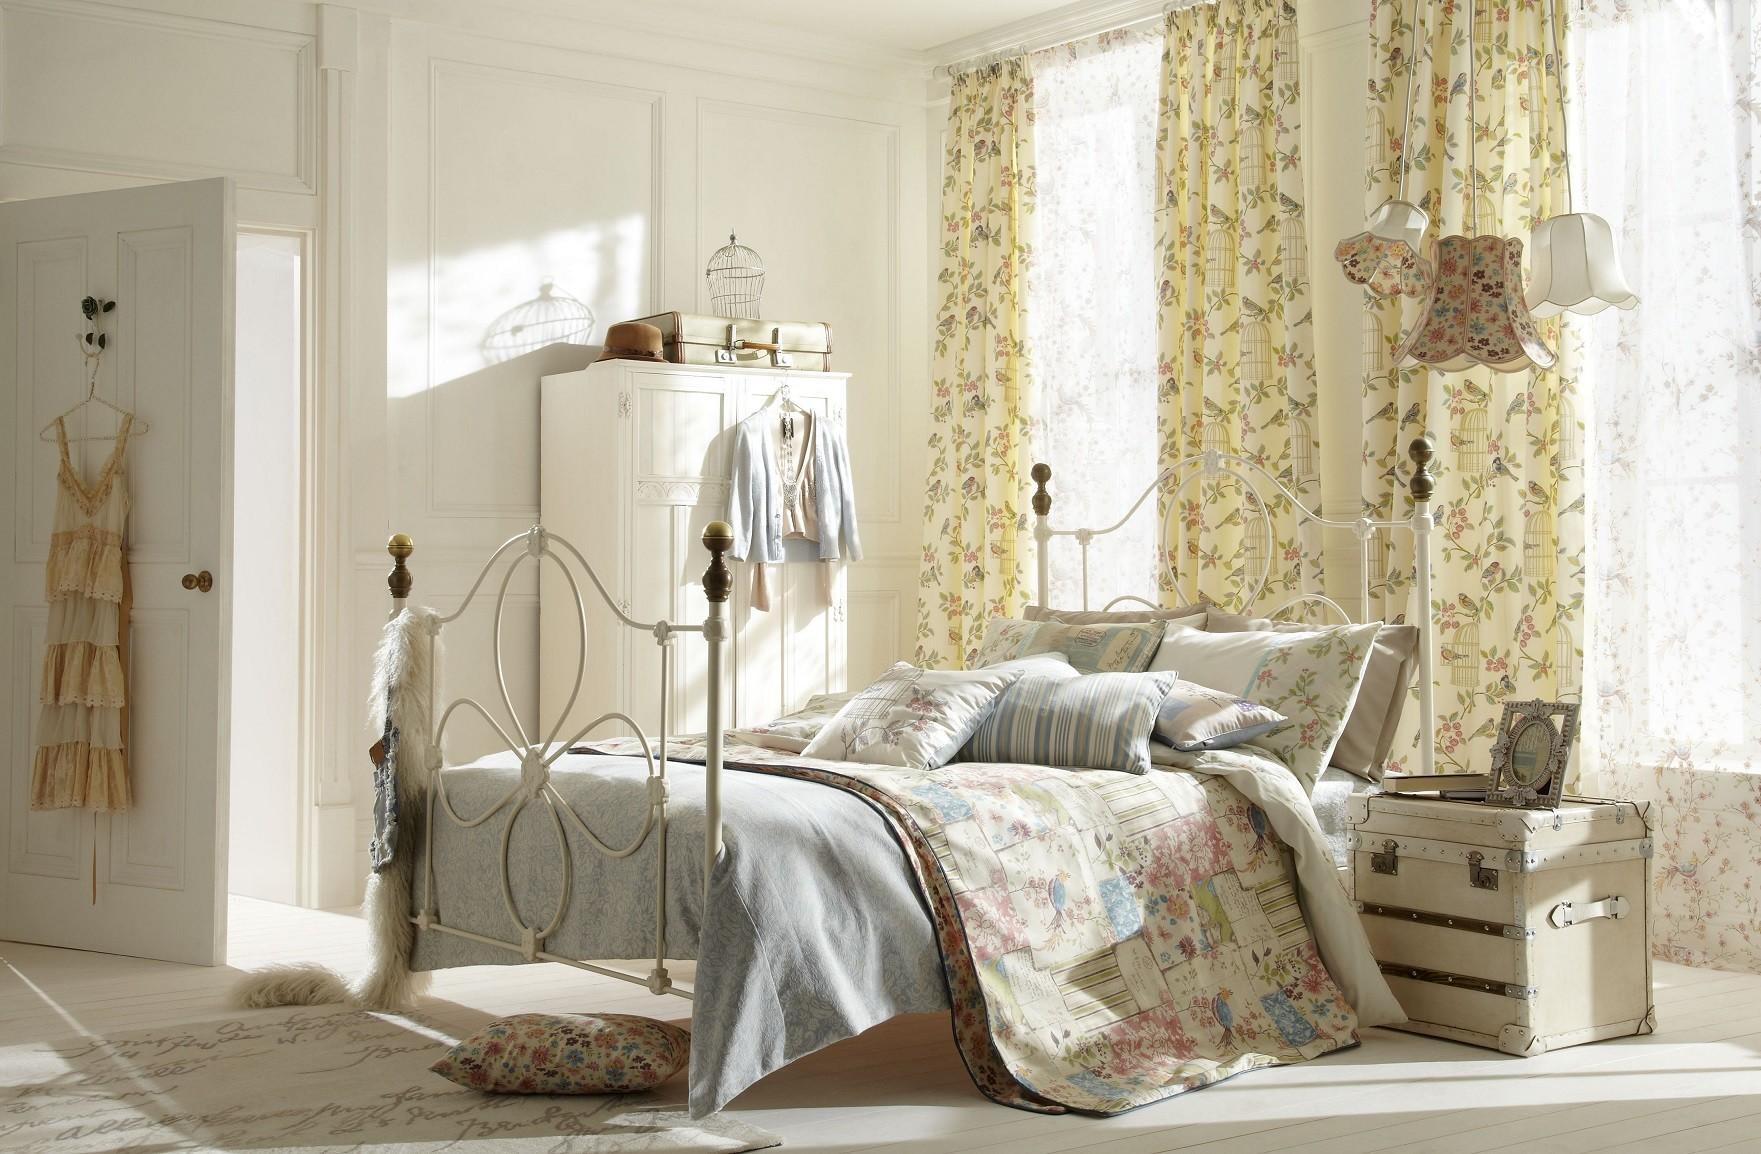 Kamar tidur romantis shabby chic bunga-bunga // decoratorist.com